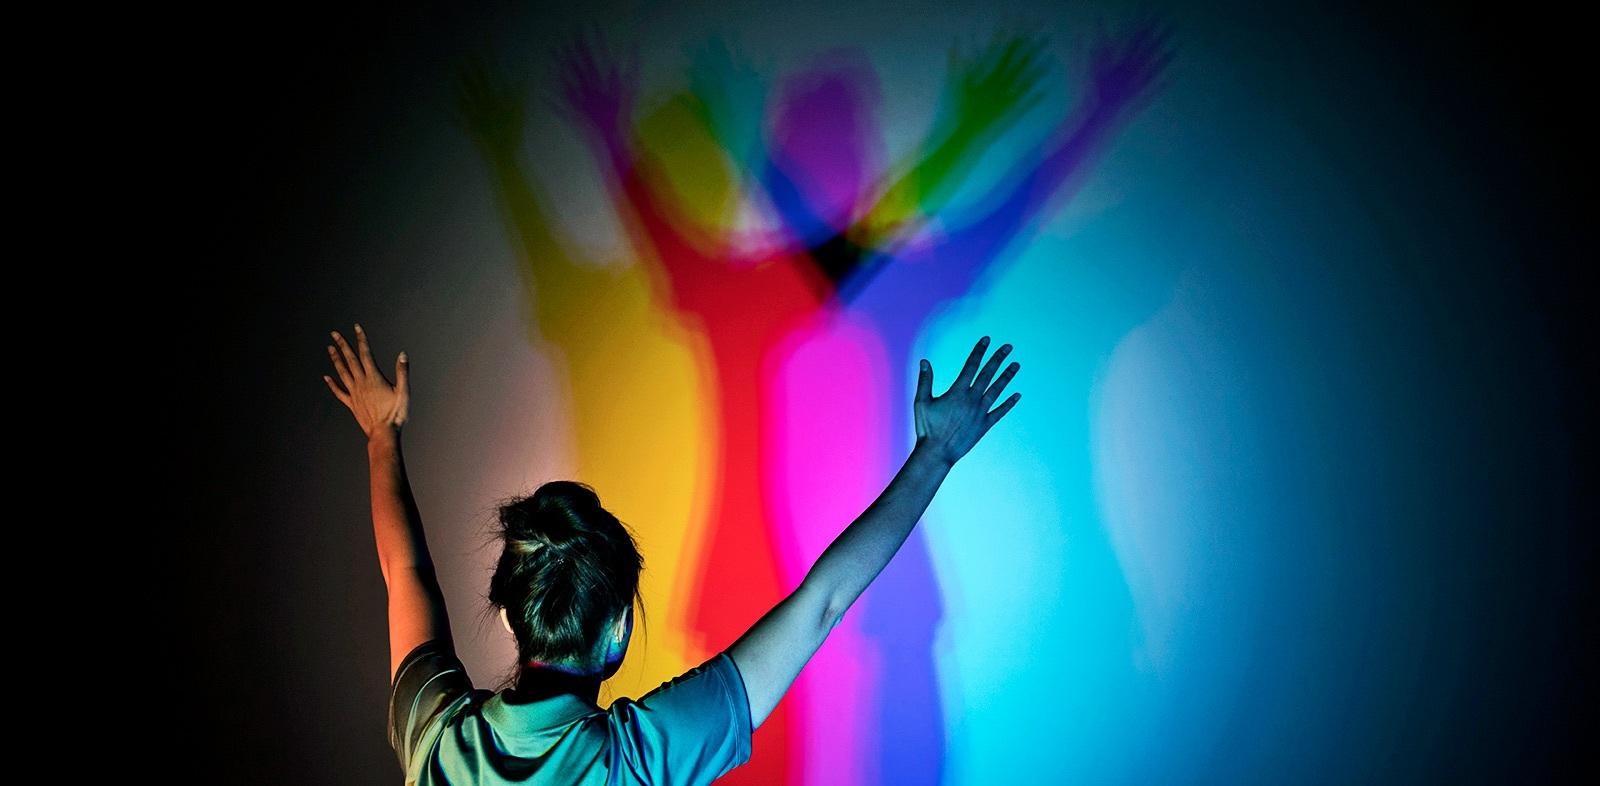 *multi-colored-light-shadow_1600.jpg